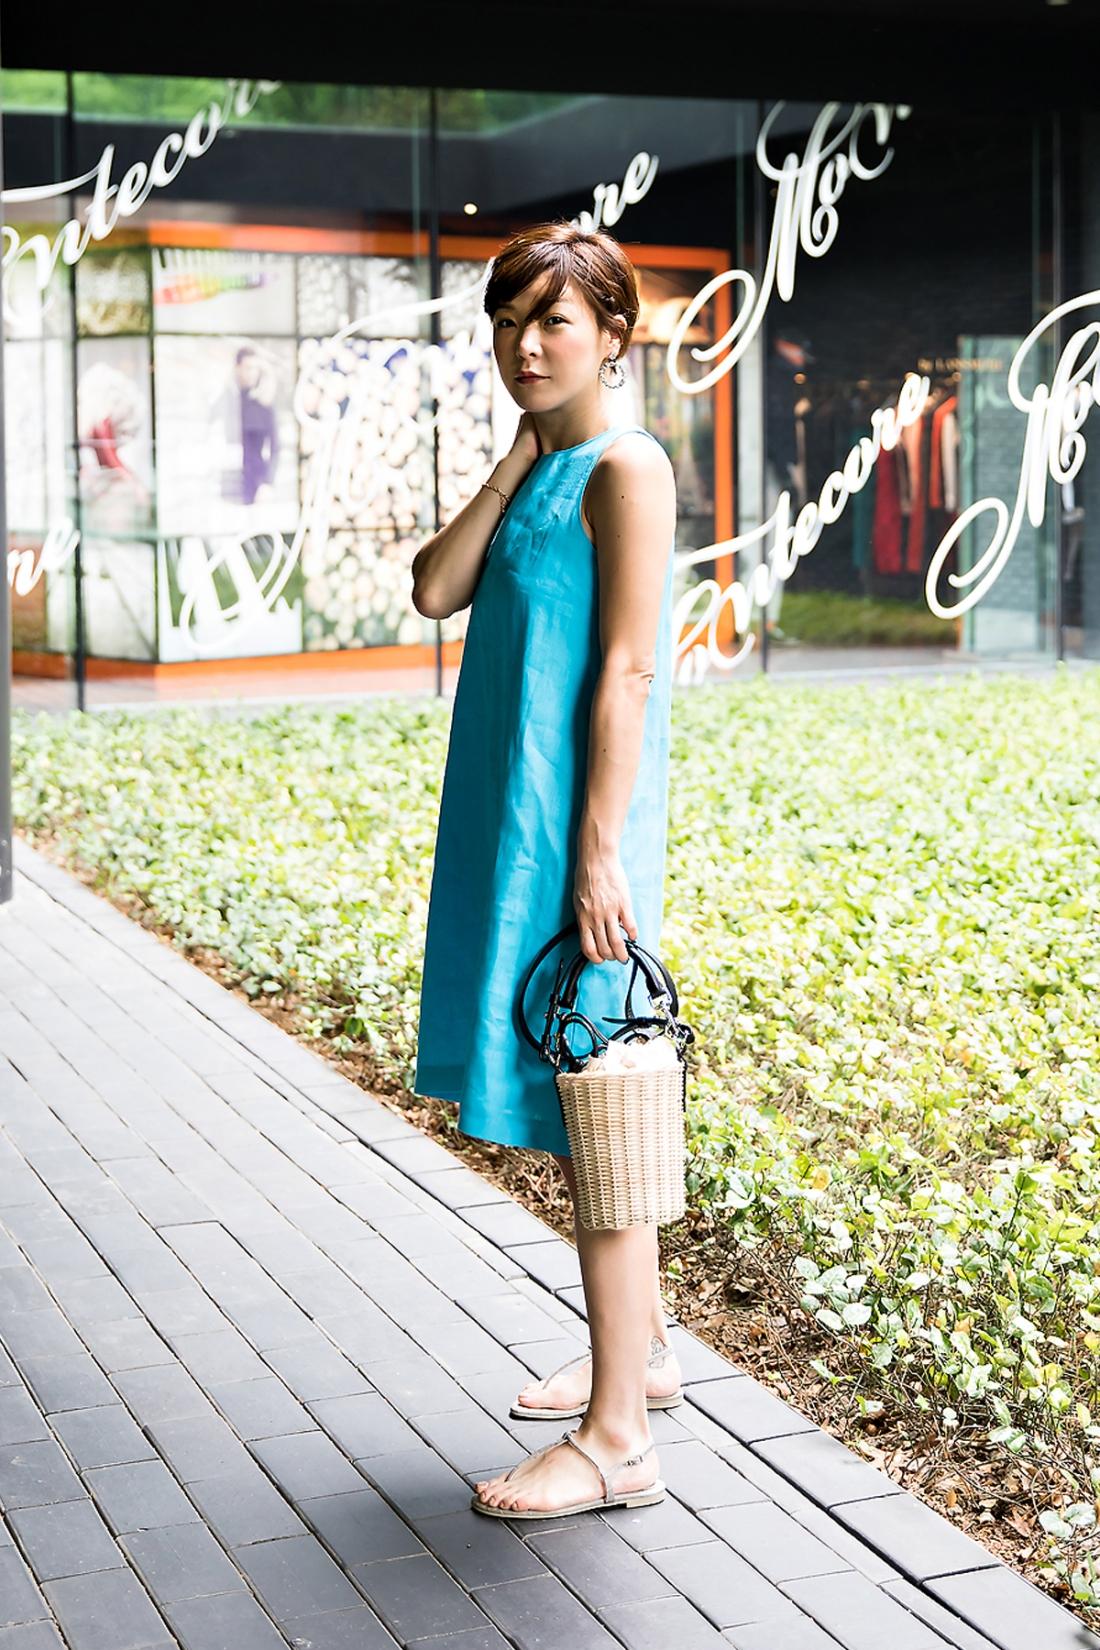 Kang Heejae, Street Fashion 2017 in Seoul.jpg